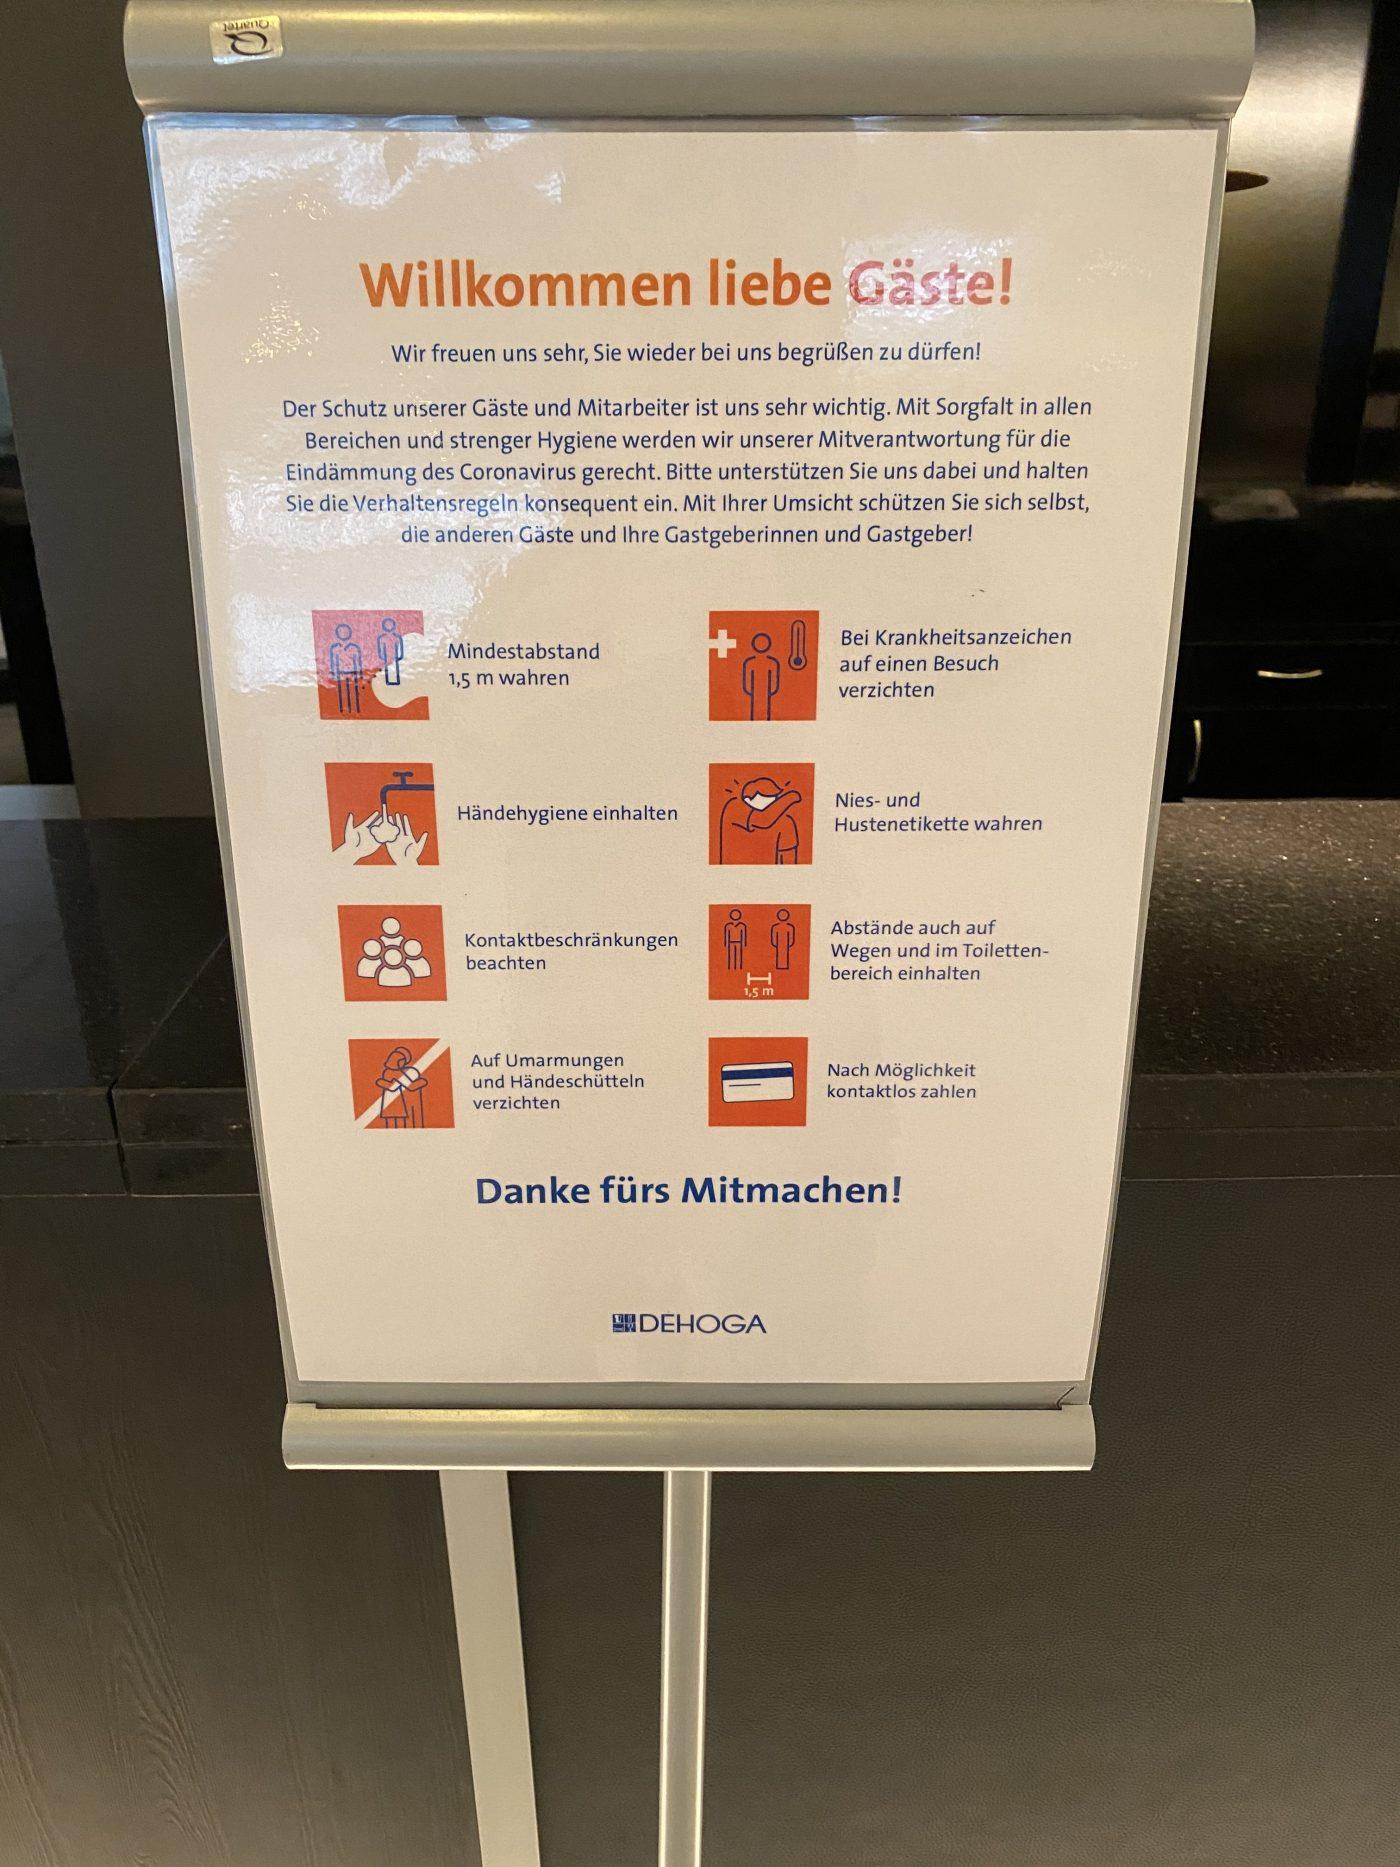 Hilton Dresden Hygienevorschrift